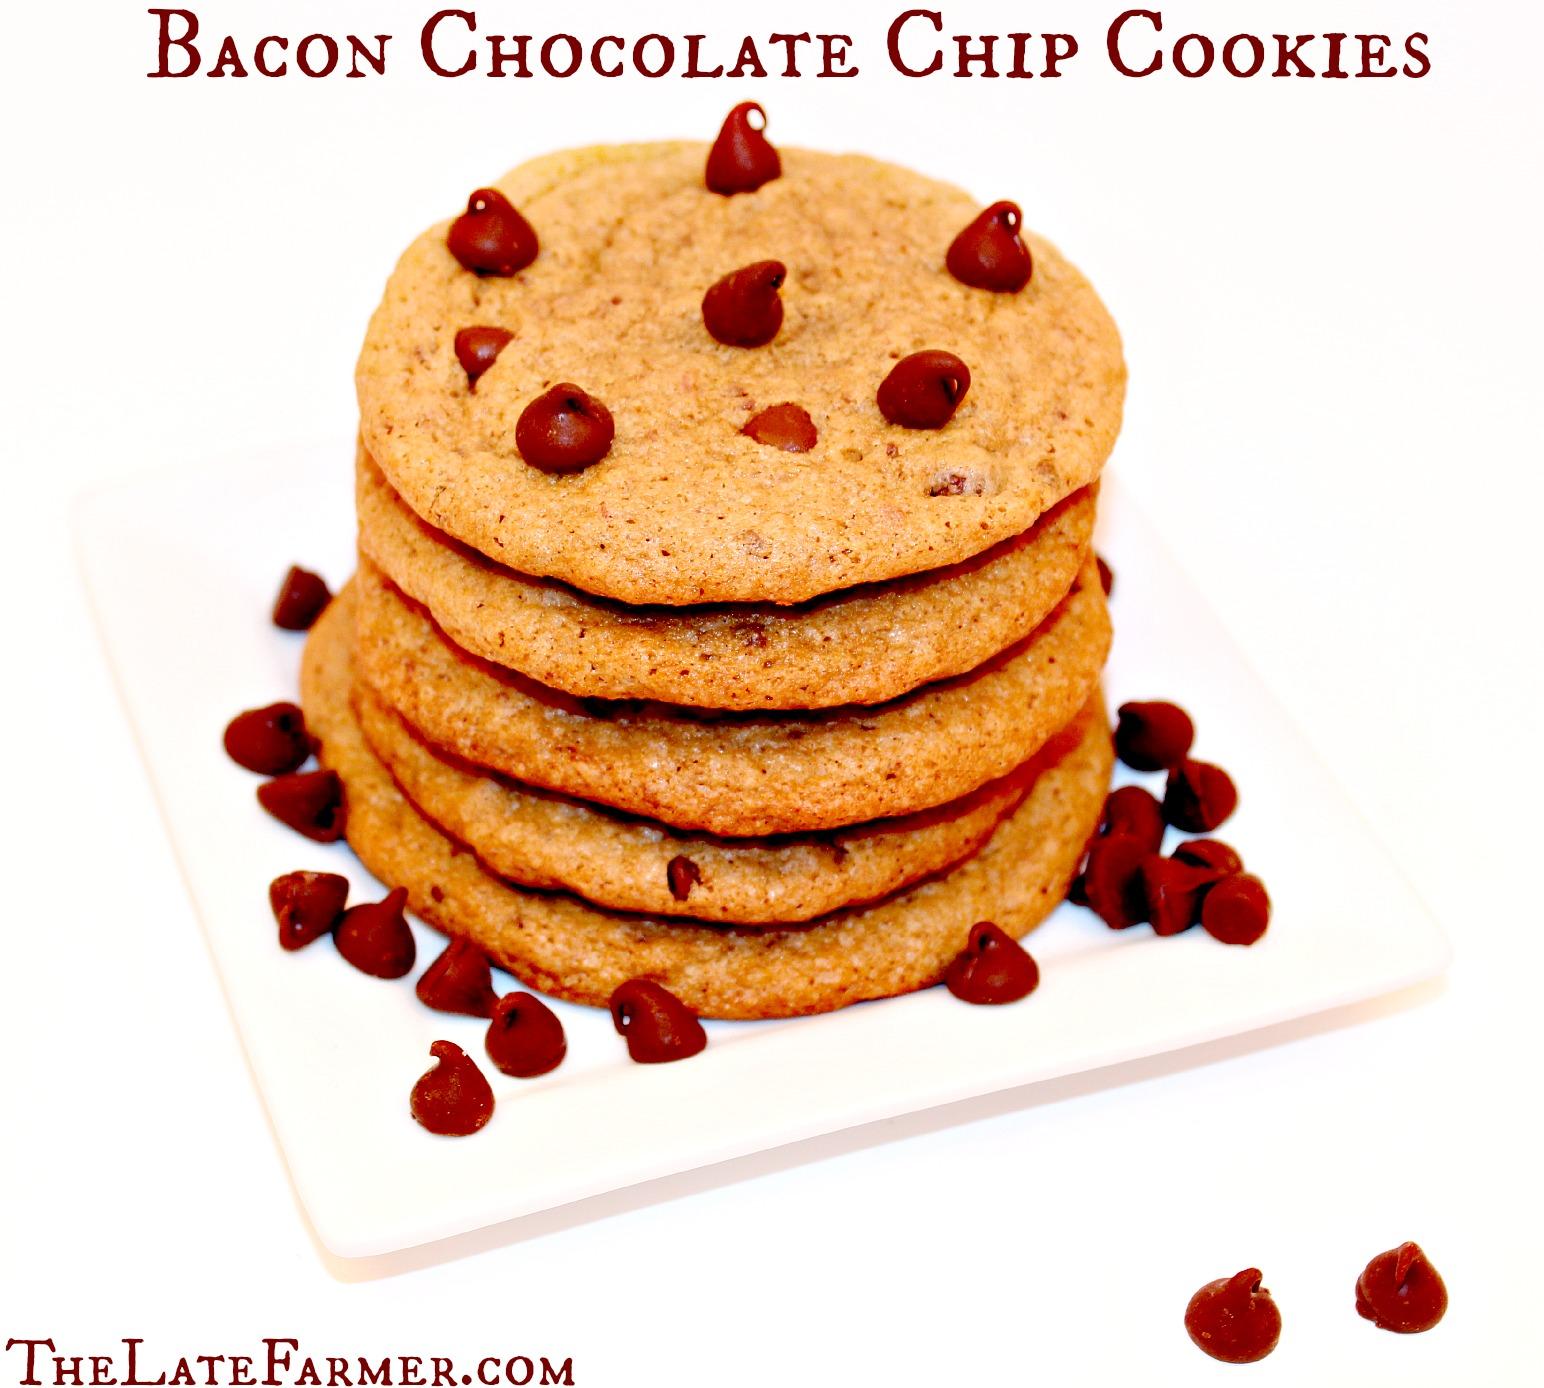 Bacon Chocolate Chip Cookies - TheLateFarmer.com Recipe